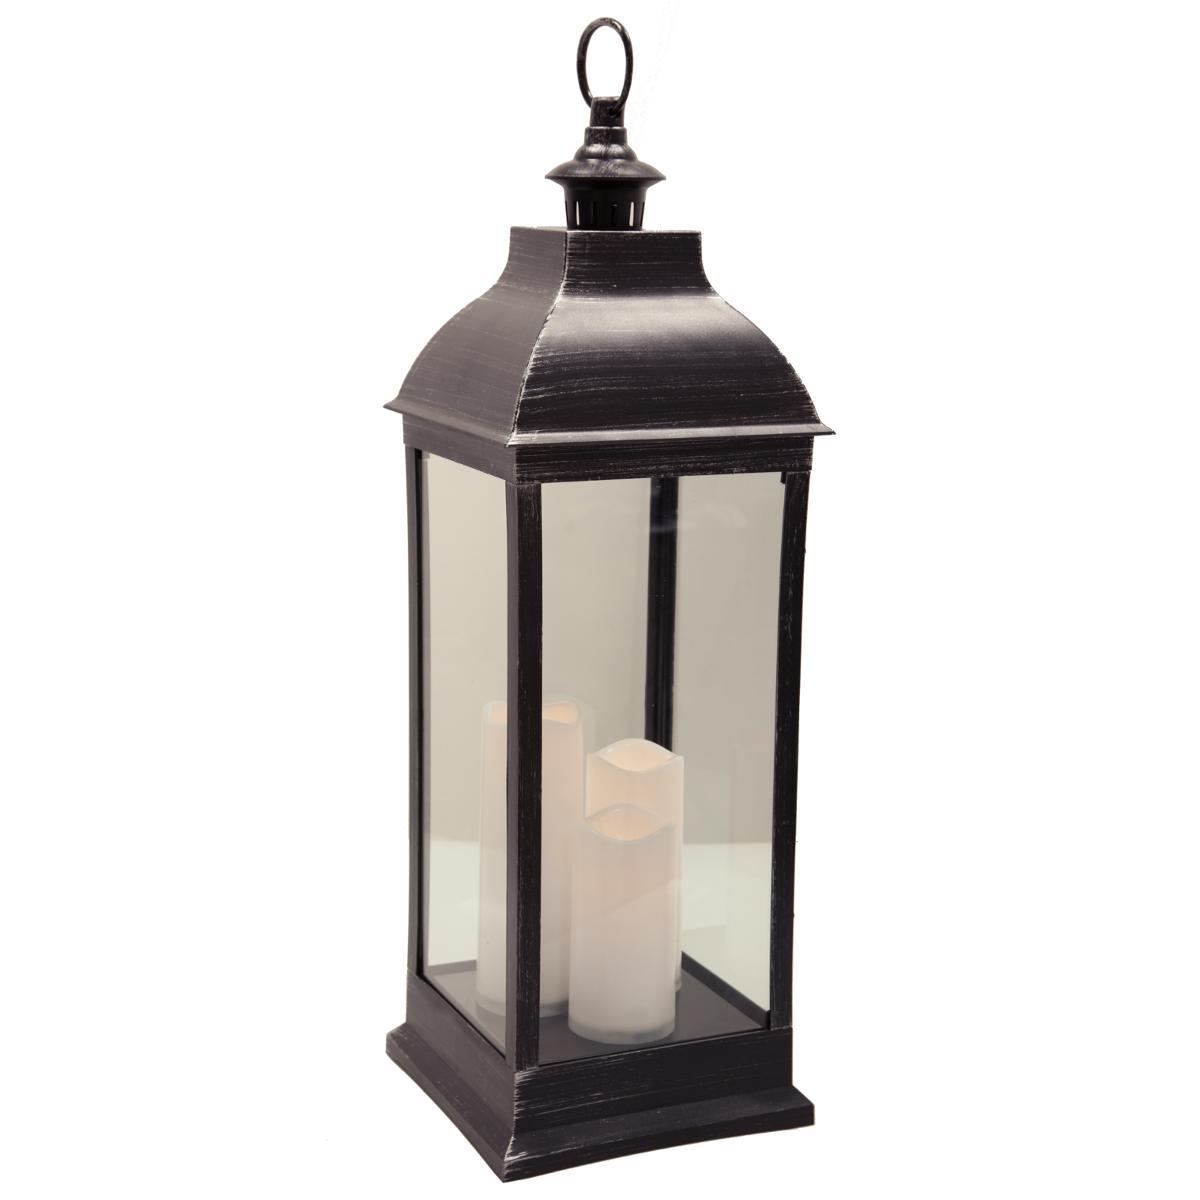 Lanterne LED antique H71 - Atmosphera